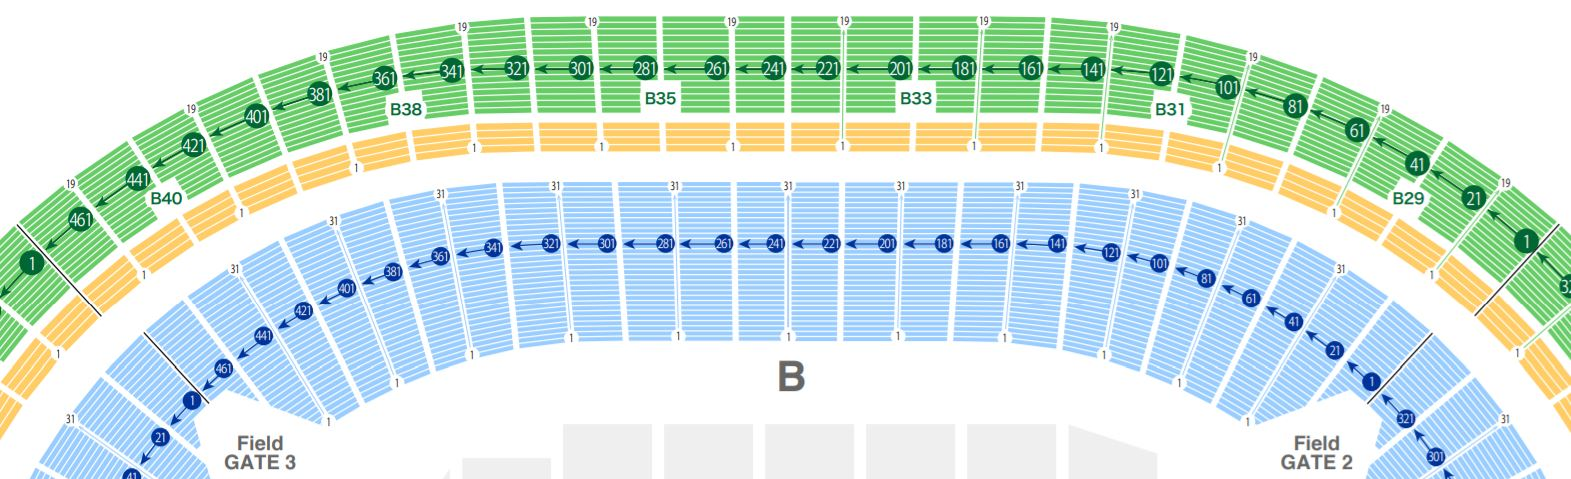 tokyo stadium seat number chart rwc2019